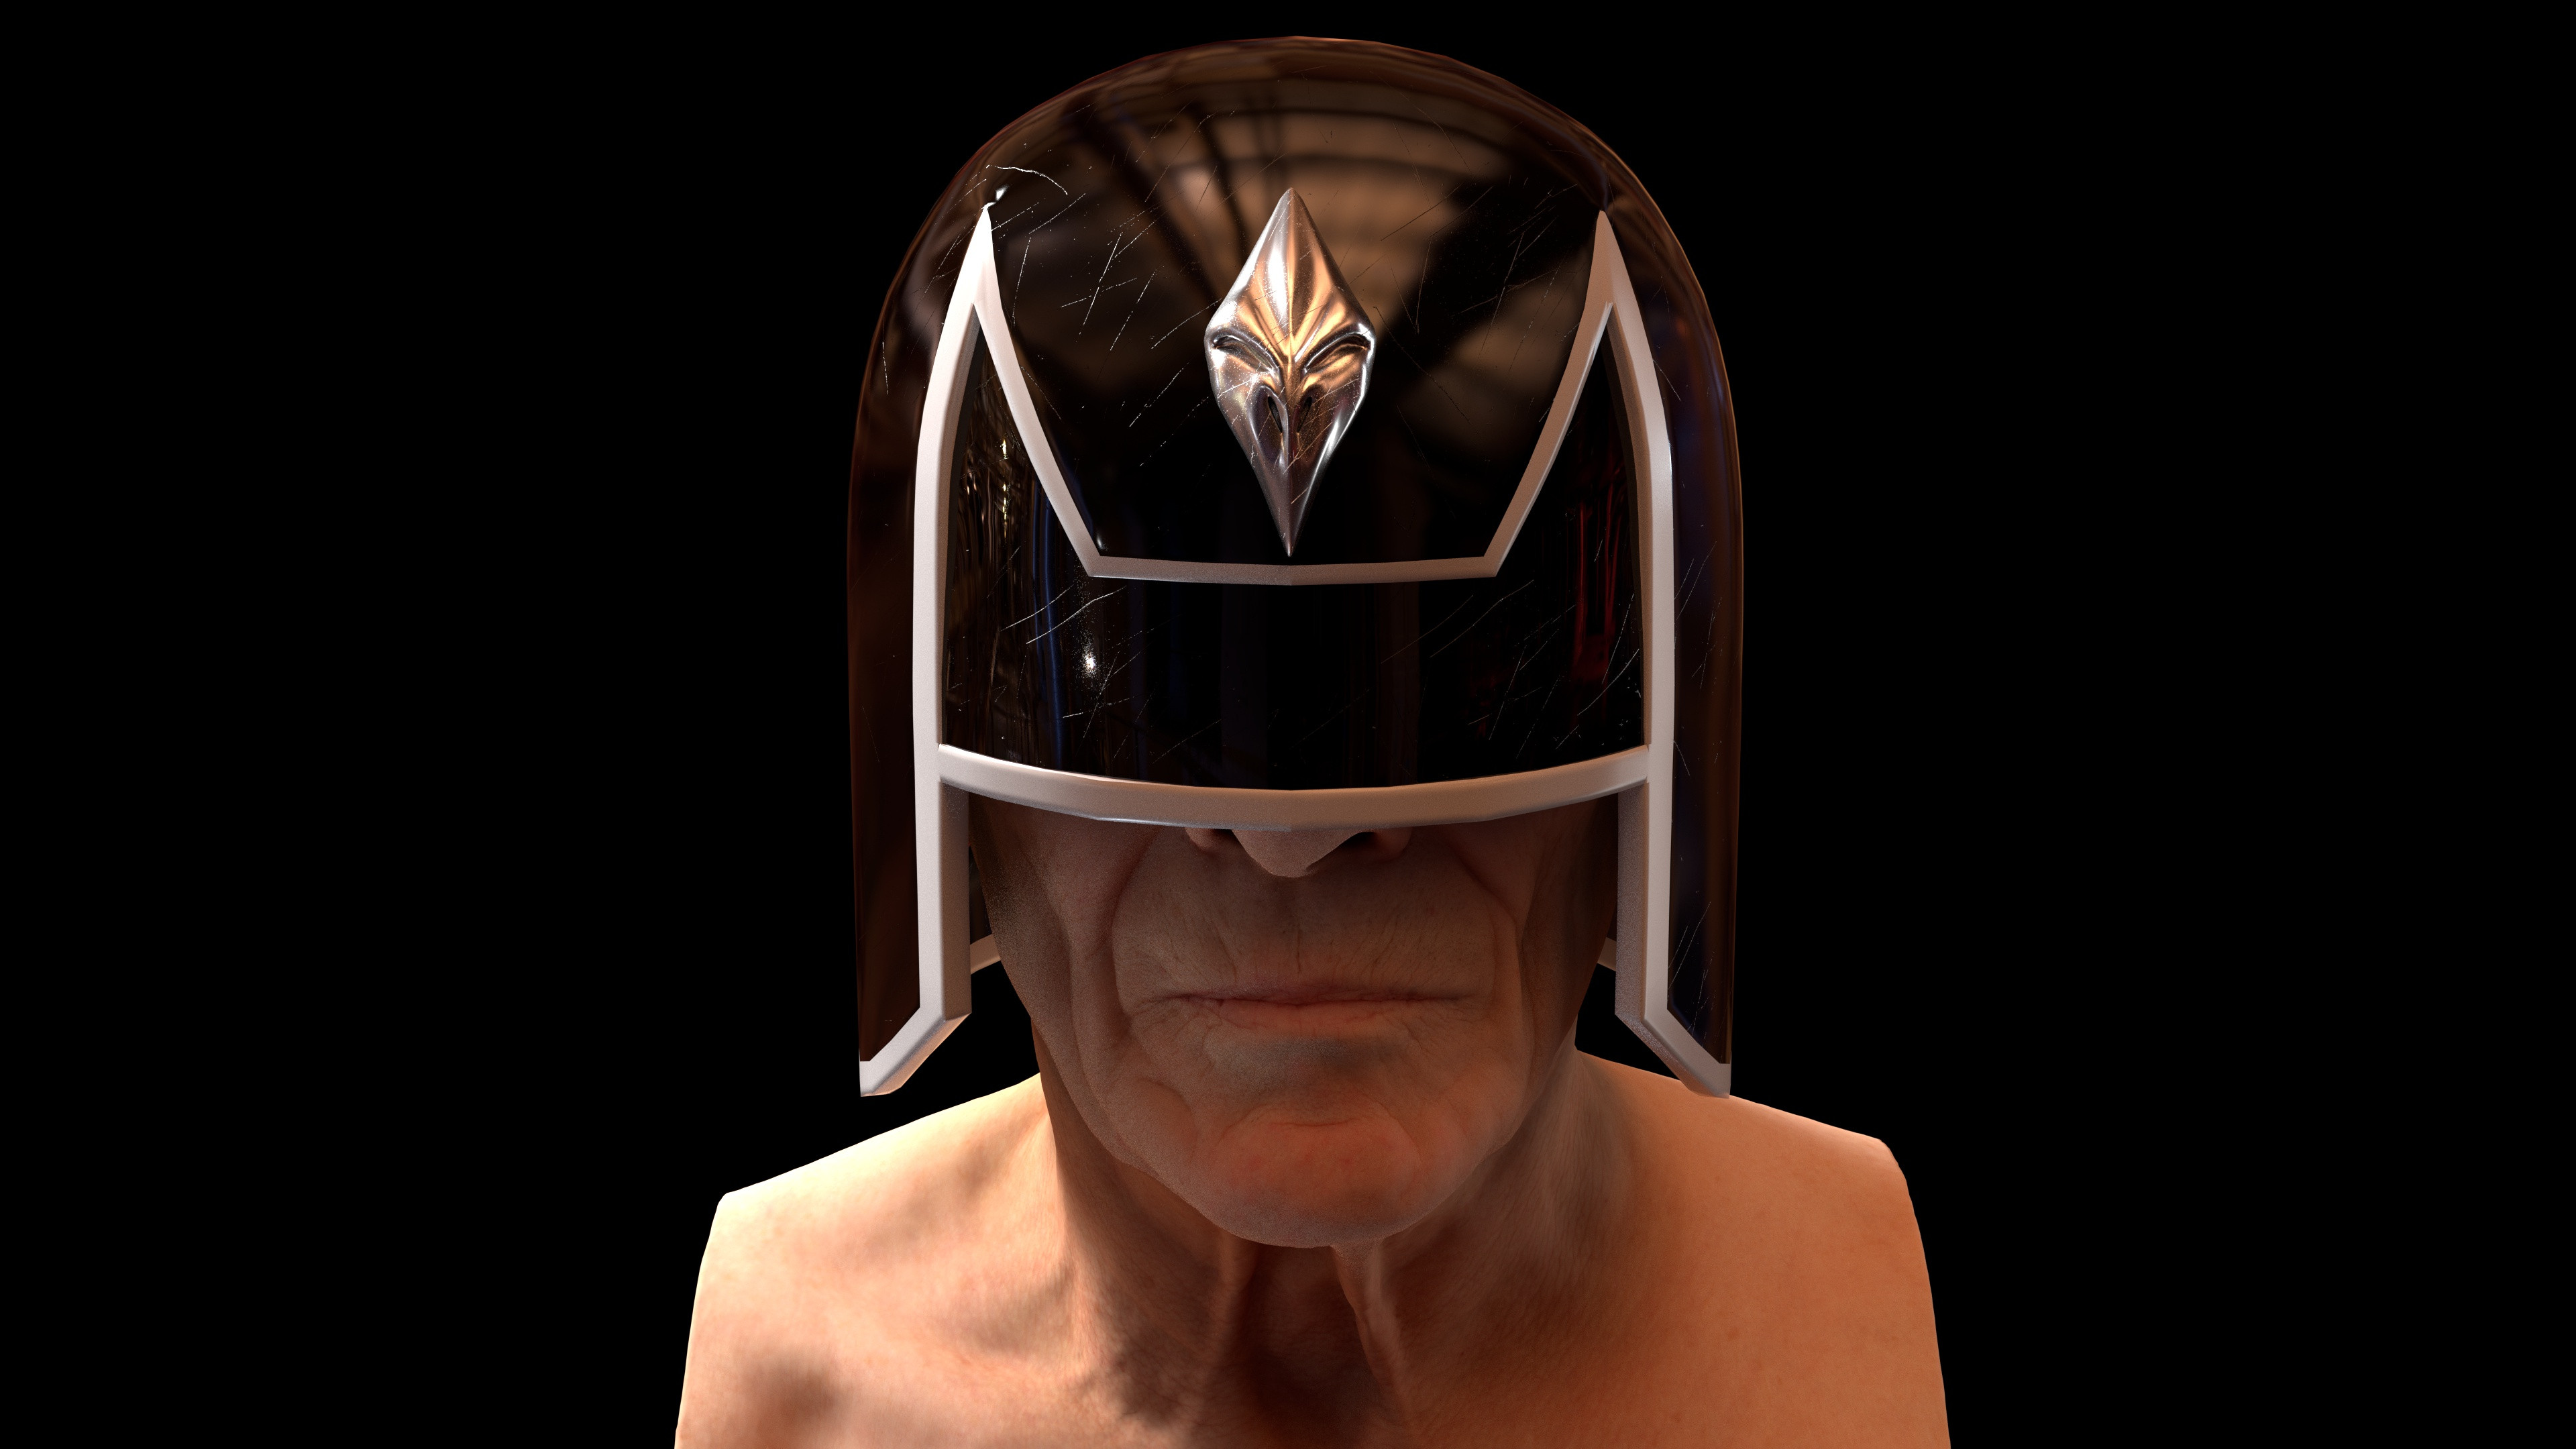 Deadworld Judge Helmet based on a design by Peter Doherty (Head sculpt by Ten24)